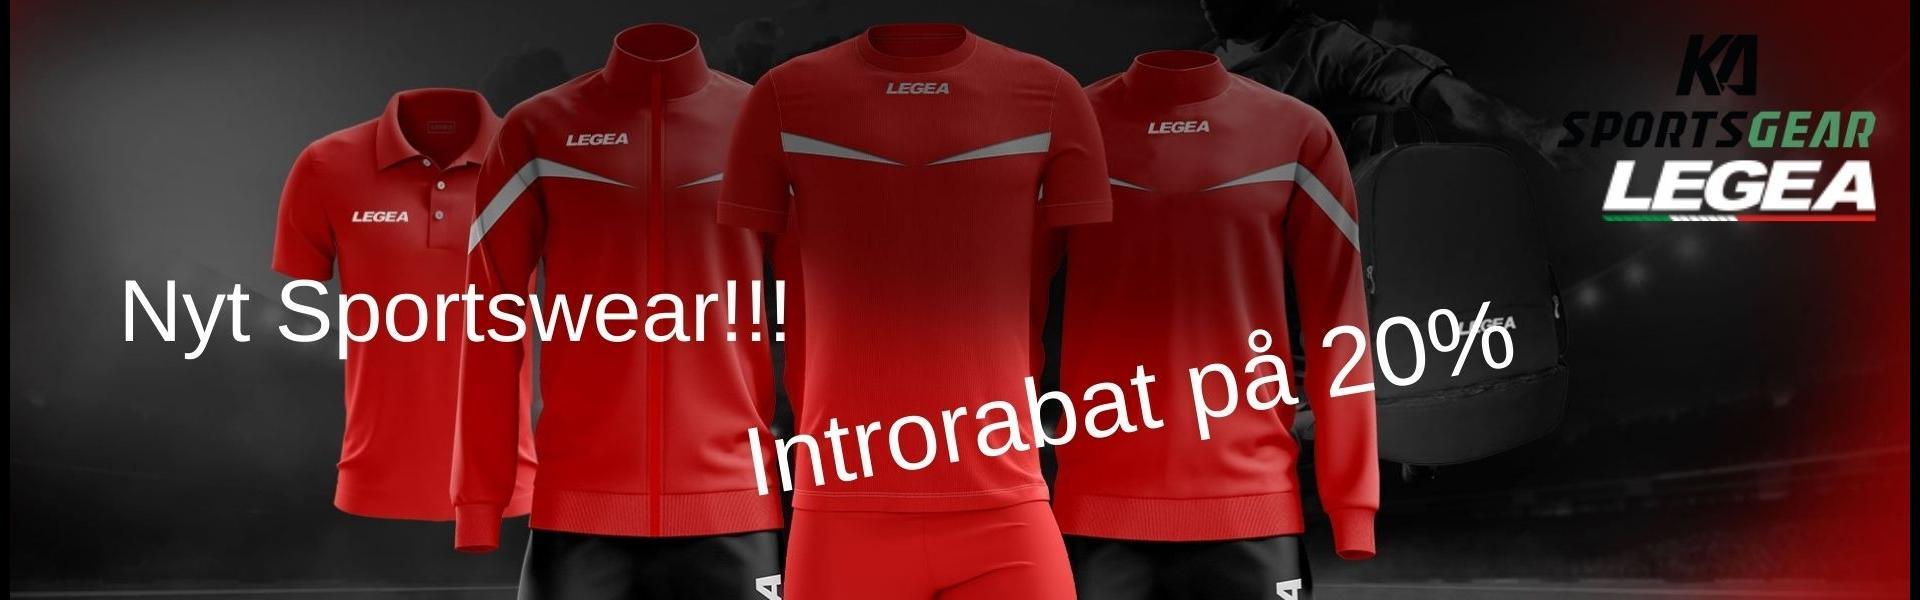 LEGEA - Nyt brand hos KA Sportsgear